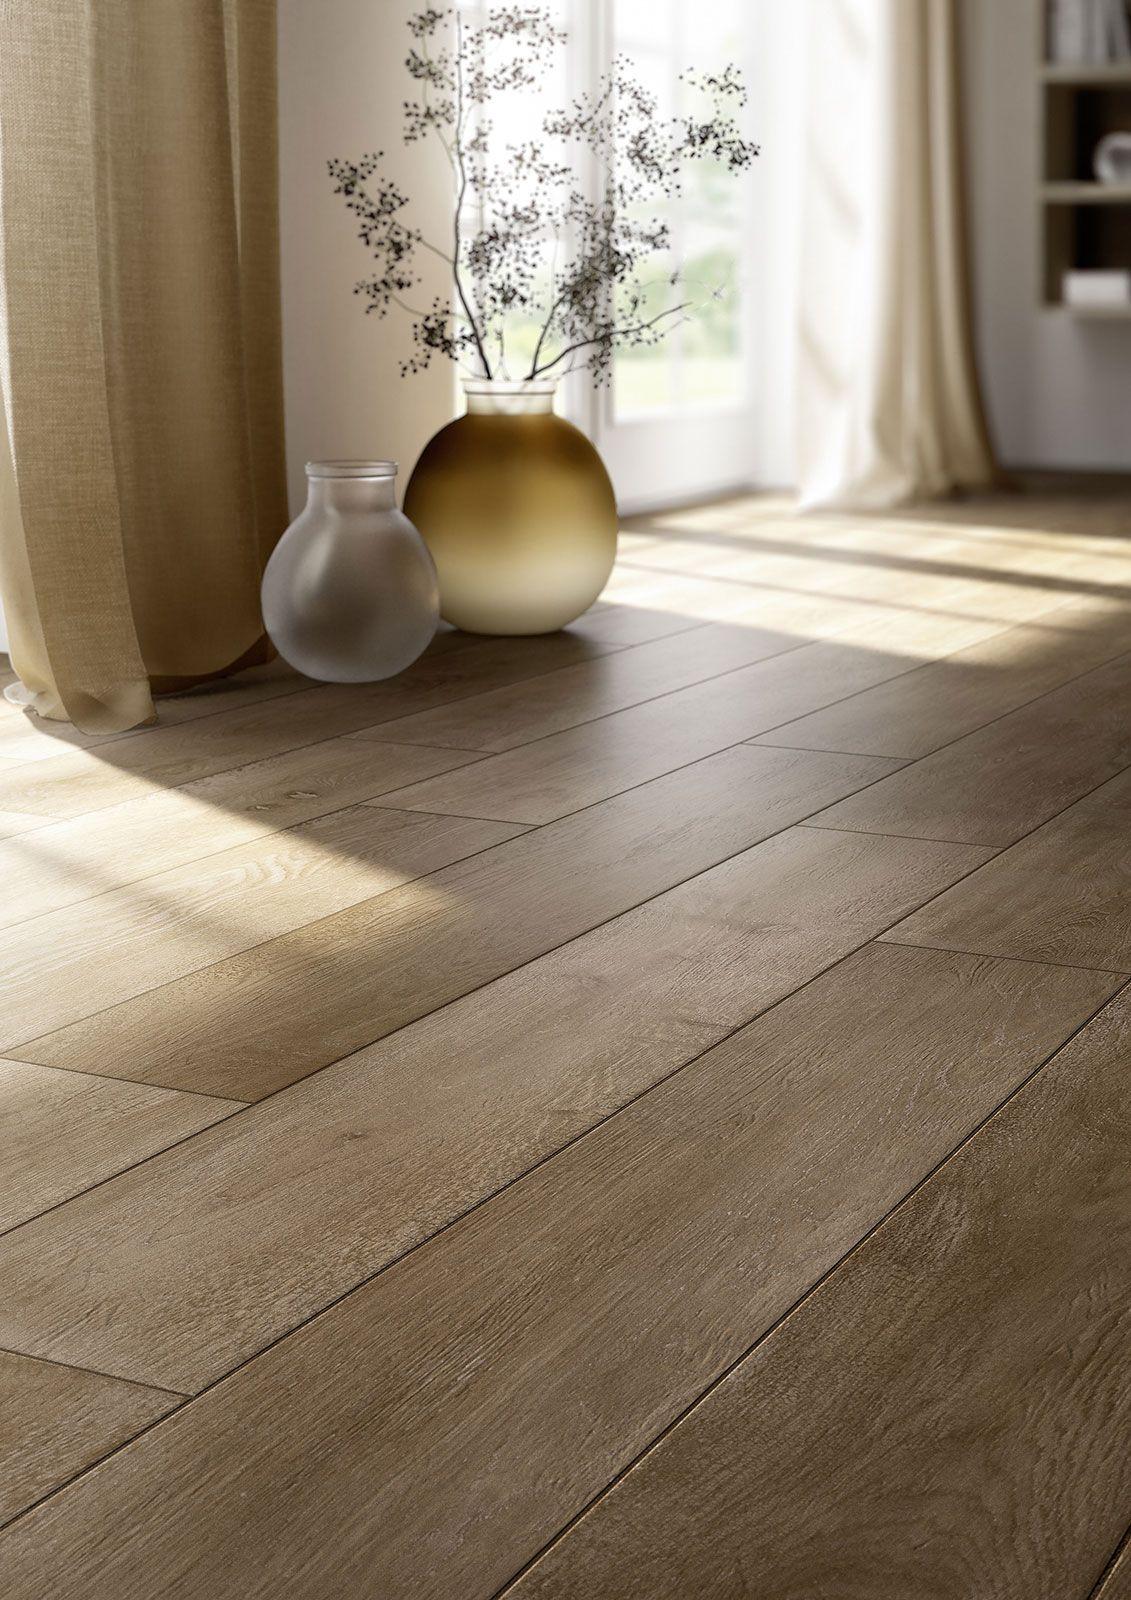 Treverktime wood effect stoneware floors marazzi - Suelos de gres porcelanico ...